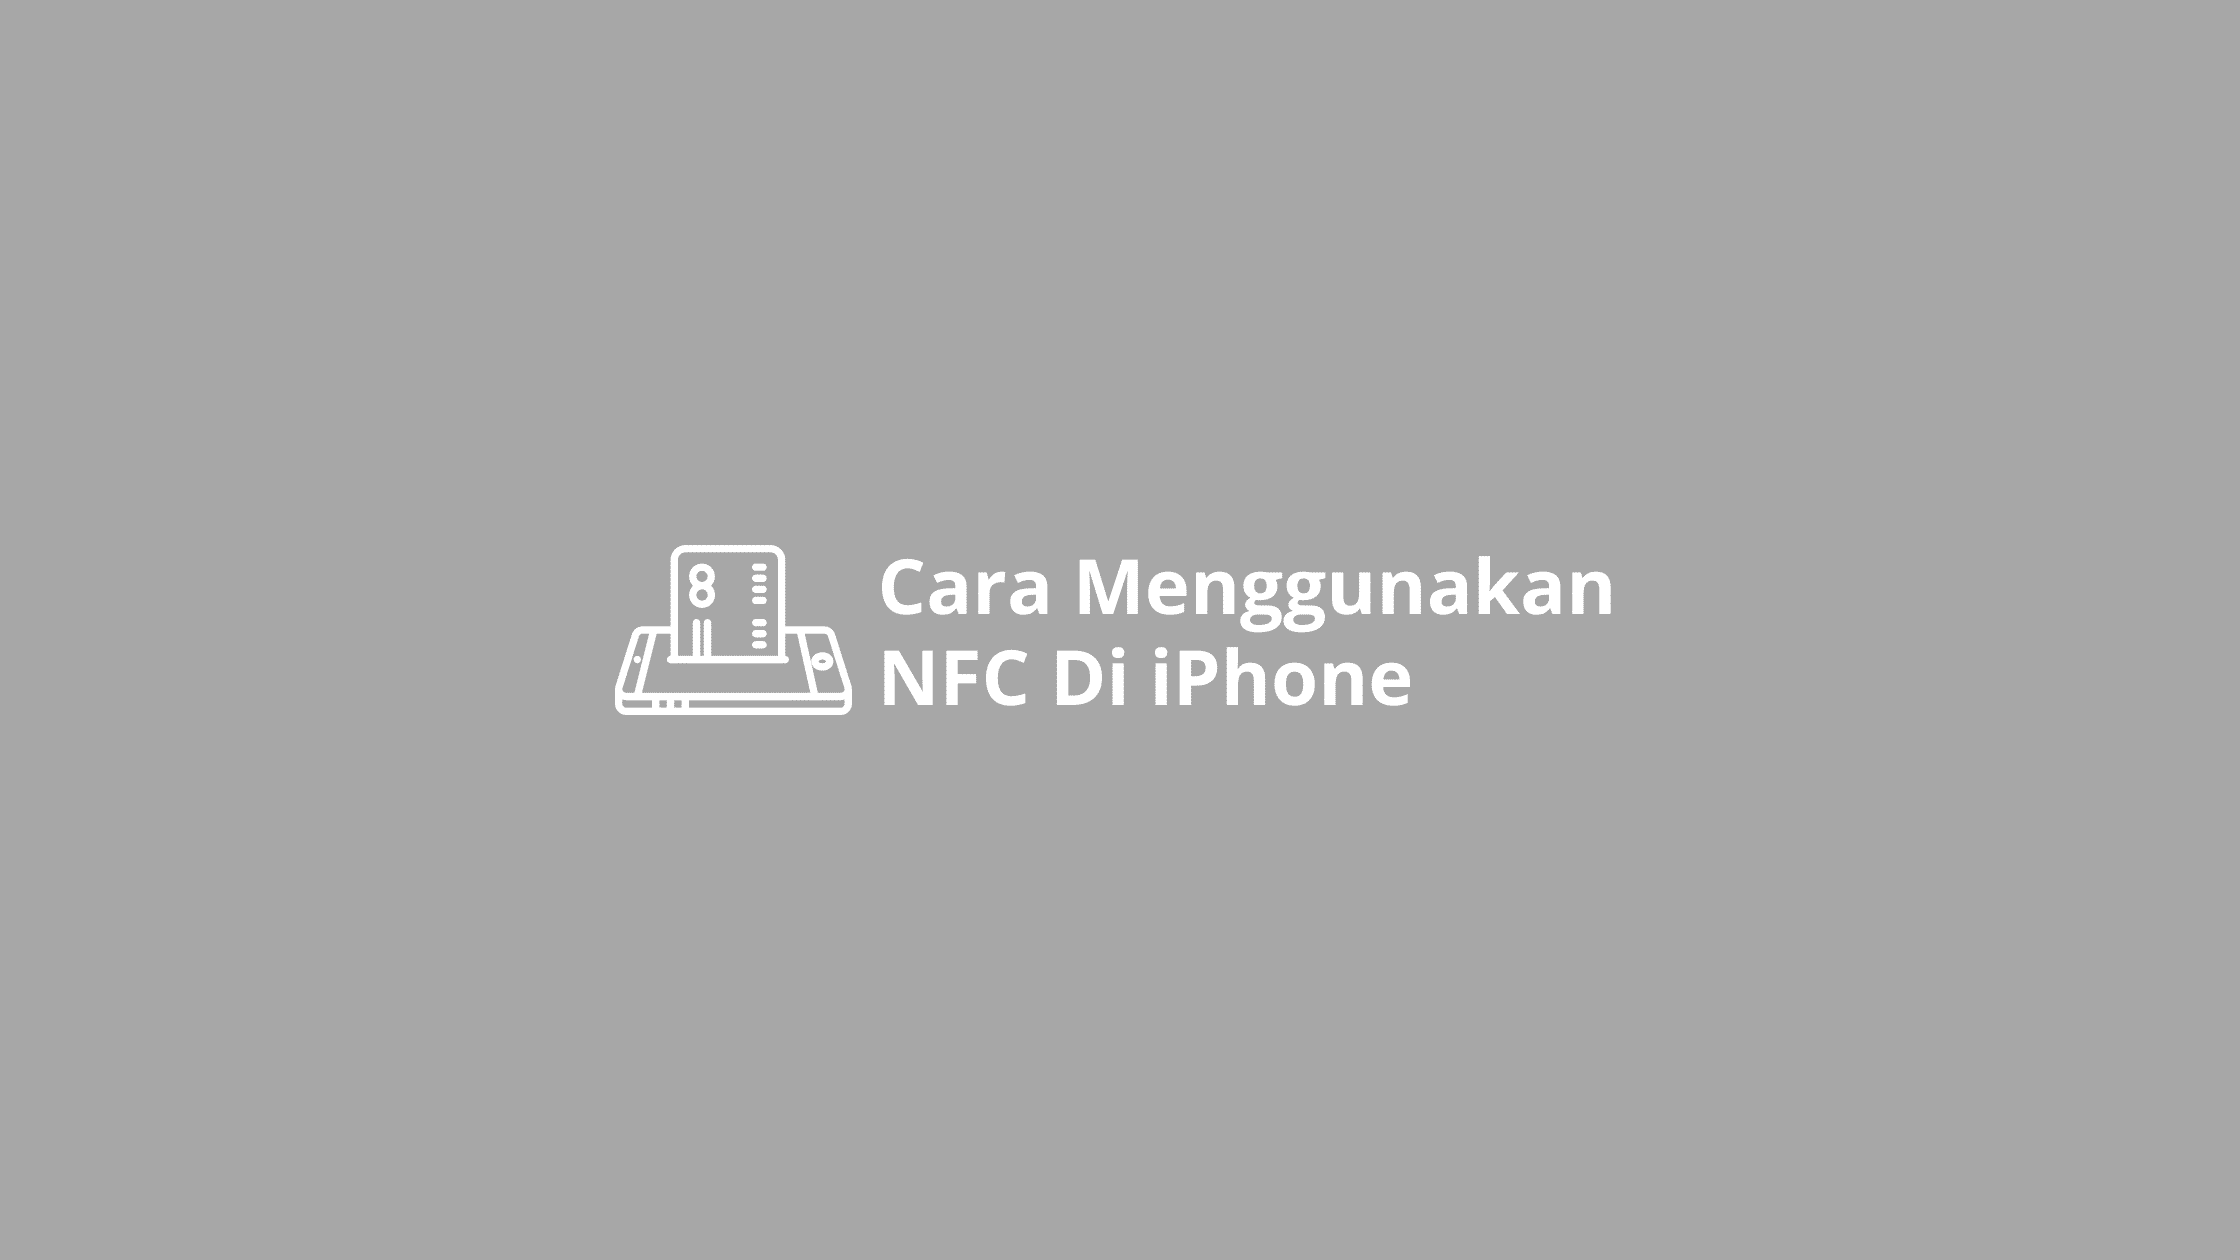 cara menggunakan nfc di iphone